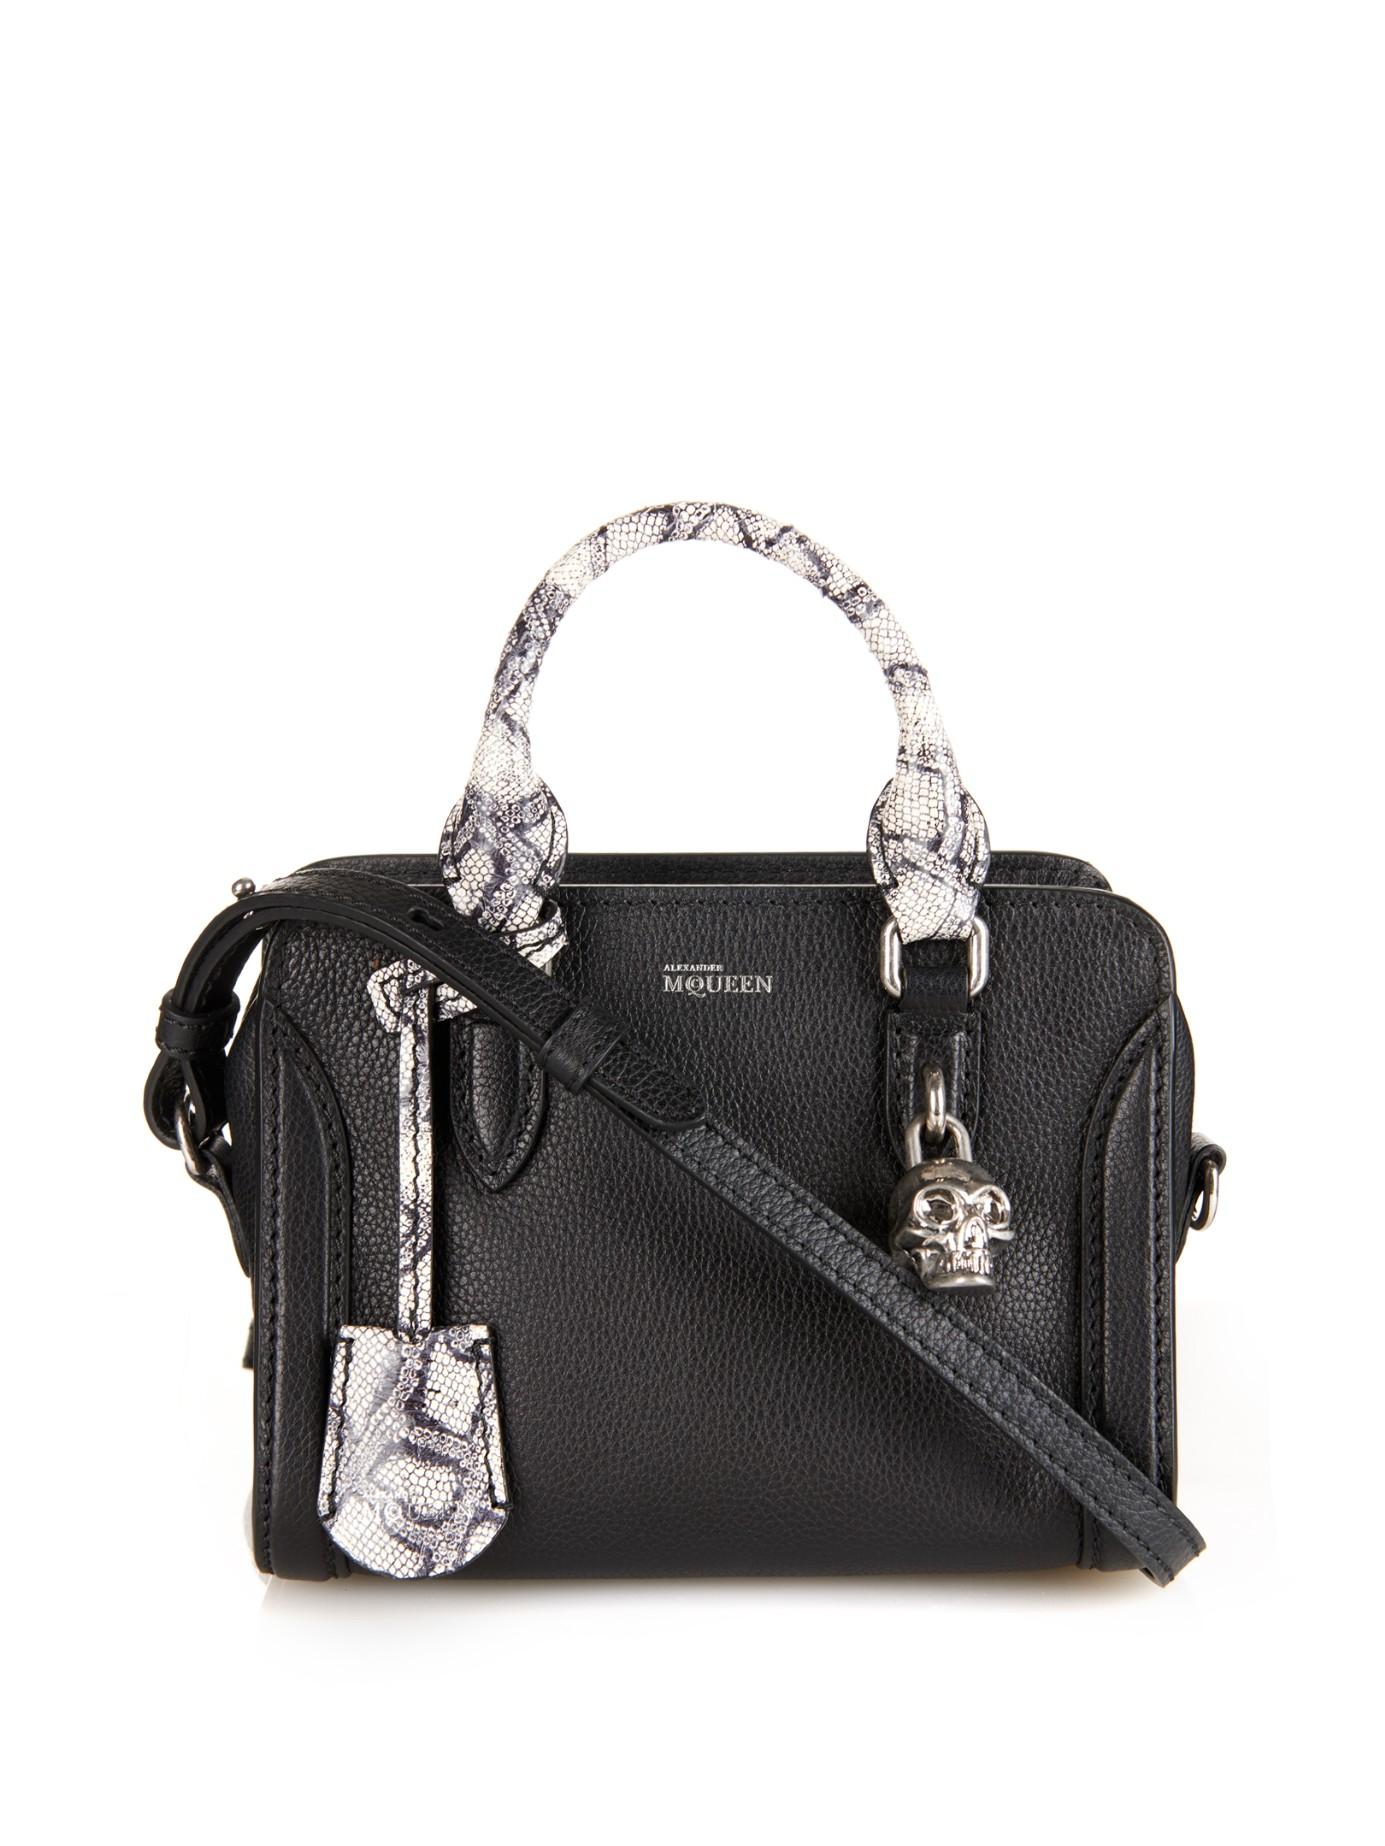 Alexander McQueen White leather Mini Crossbody bag NewLLDq